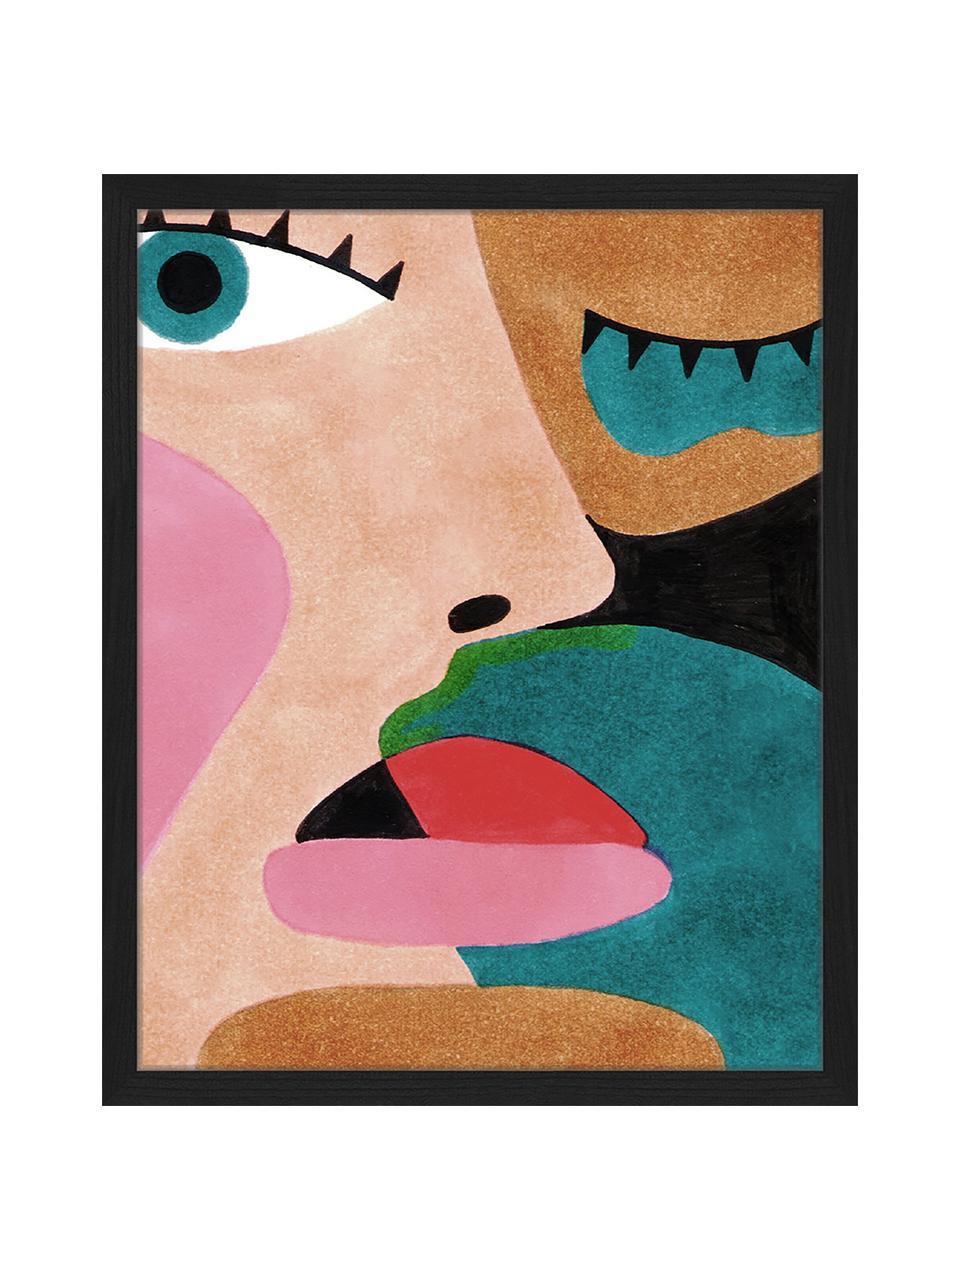 Gerahmter Digitaldruck Close Up Face, Bild: Digitaldruck auf Papier, , Rahmen: Holz, lackiert, Front: Plexiglas, Mehrfarbig, 43 x 53 cm